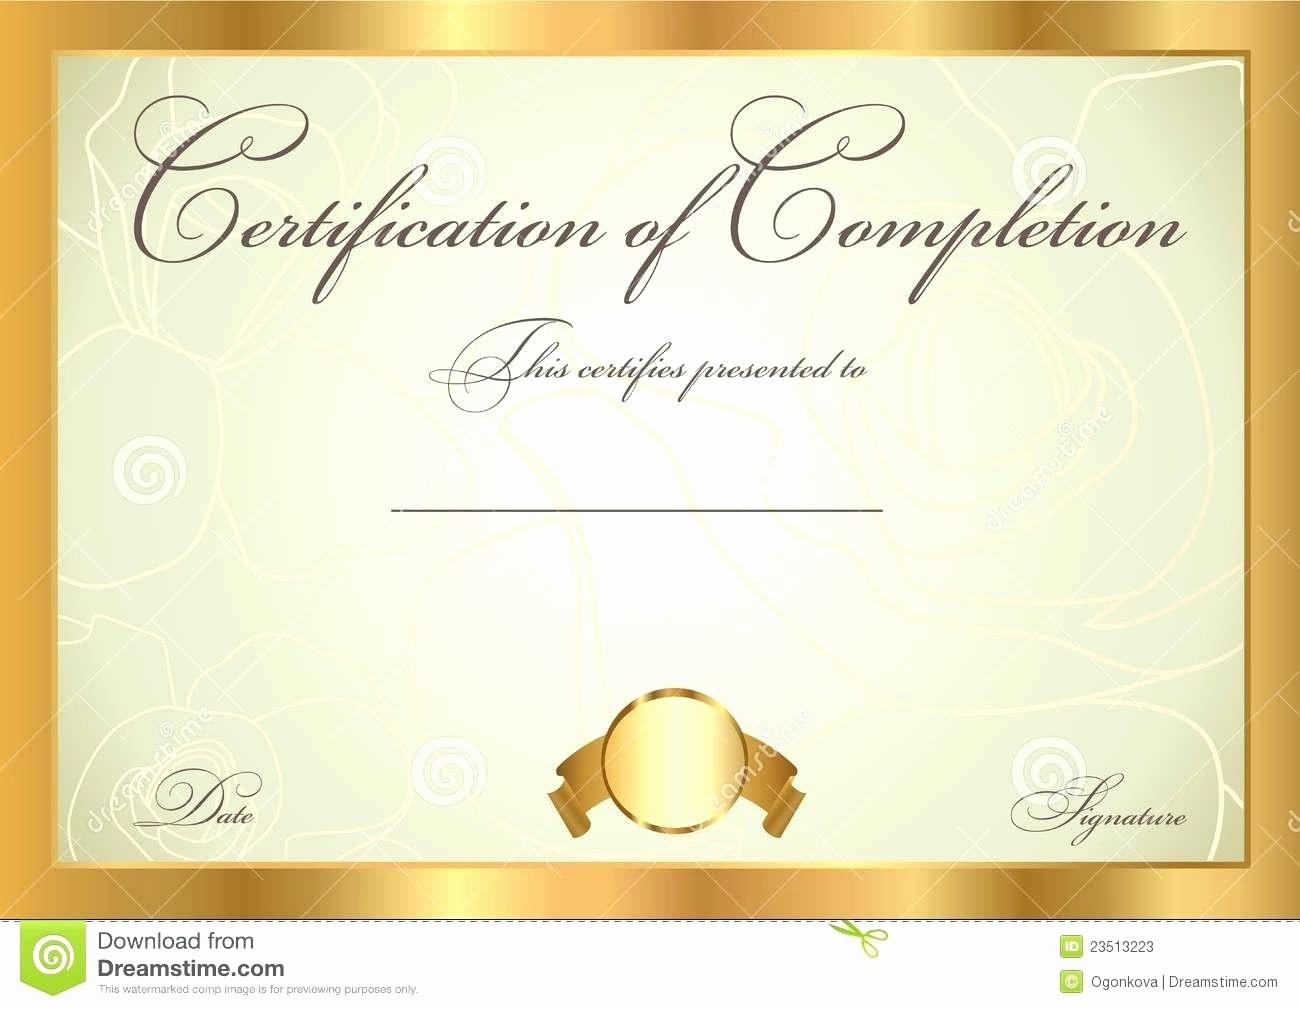 Free Downloadable Award Certificate Templates Beautiful Template Blank Award Certificate Template